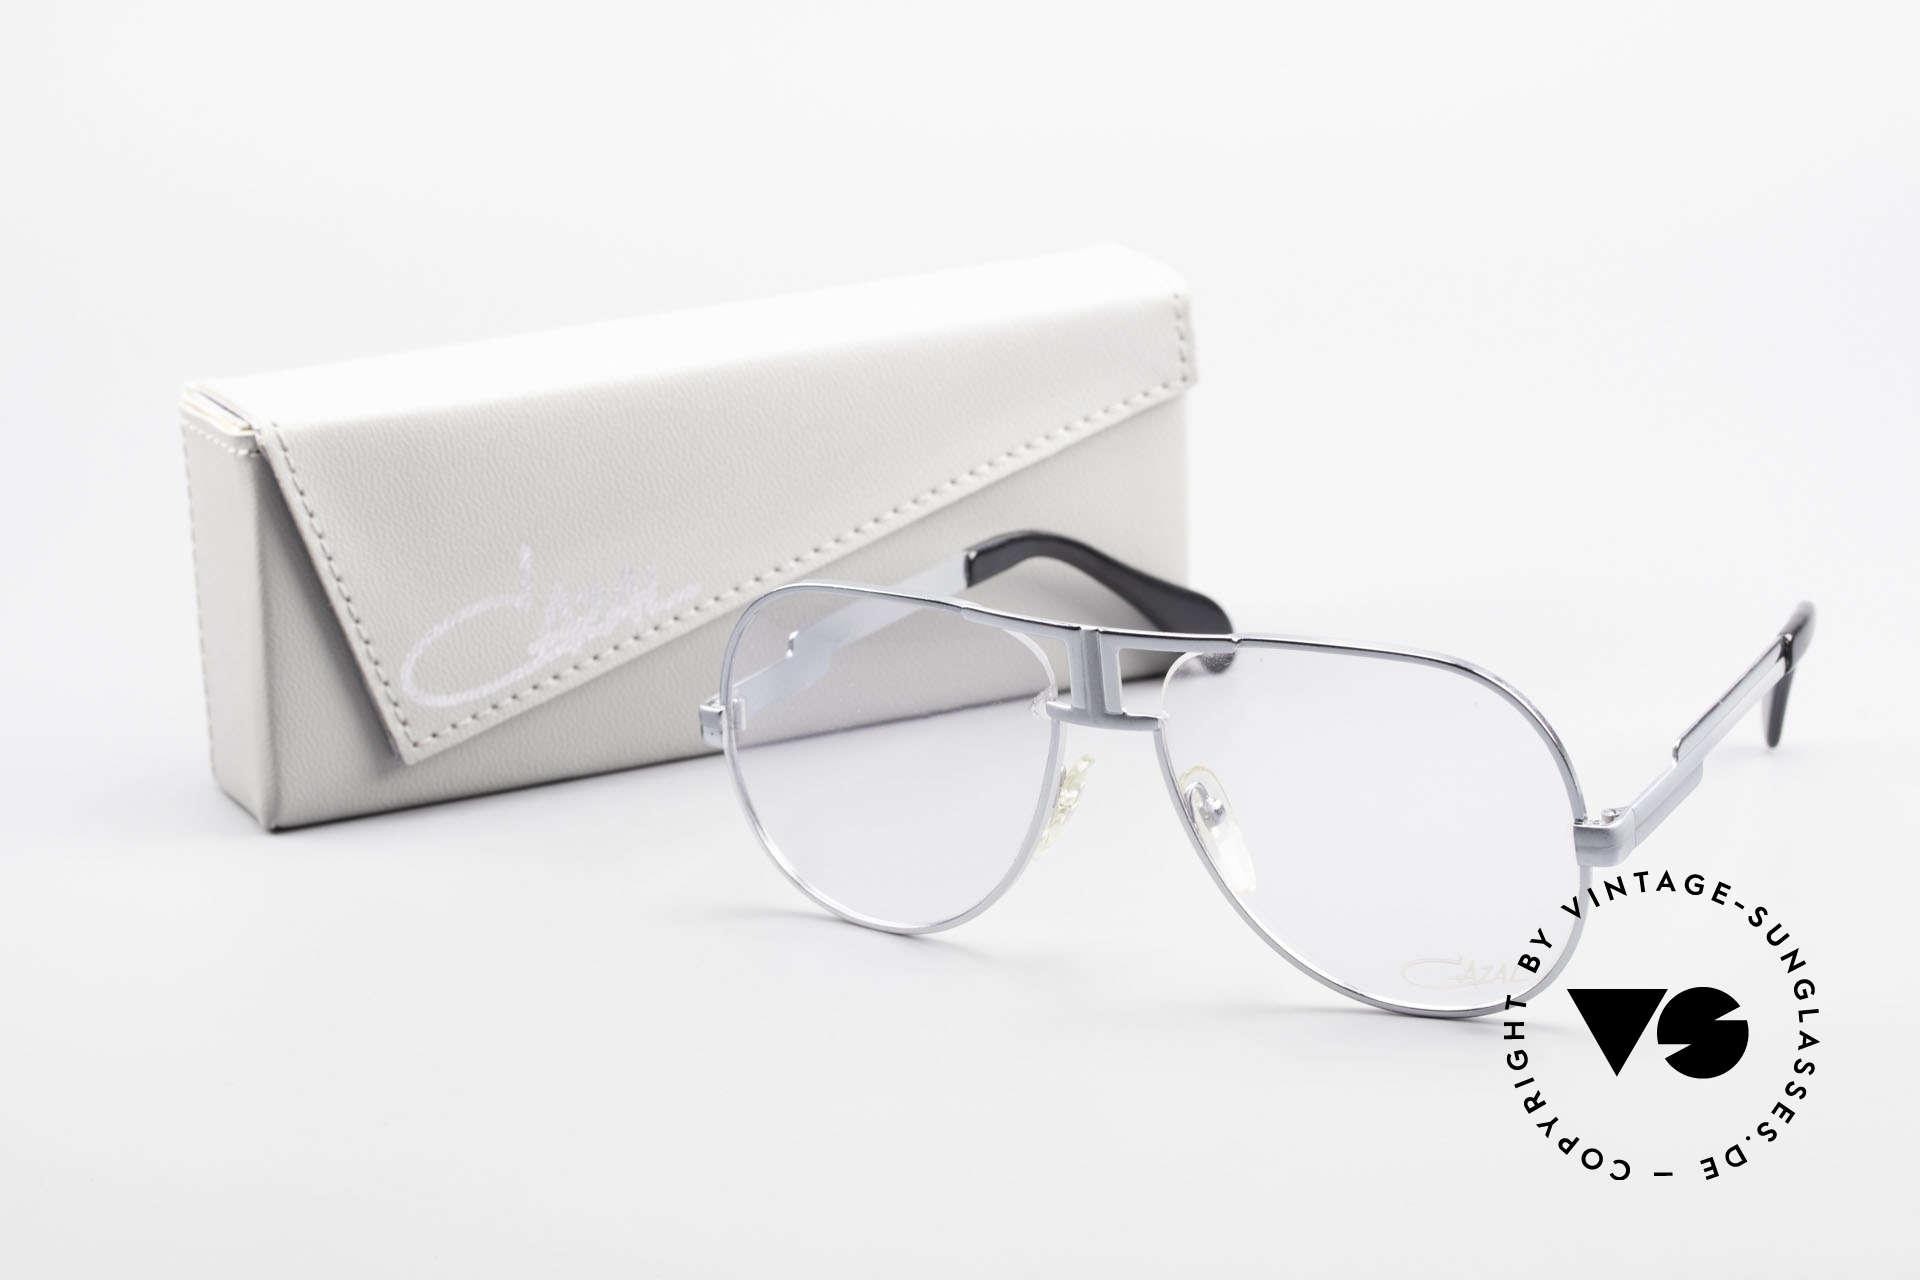 Cazal 702 Ultra Rare 70's Cazal Glasses, NO retro specs, but a genuine 40 years old original, Made for Men